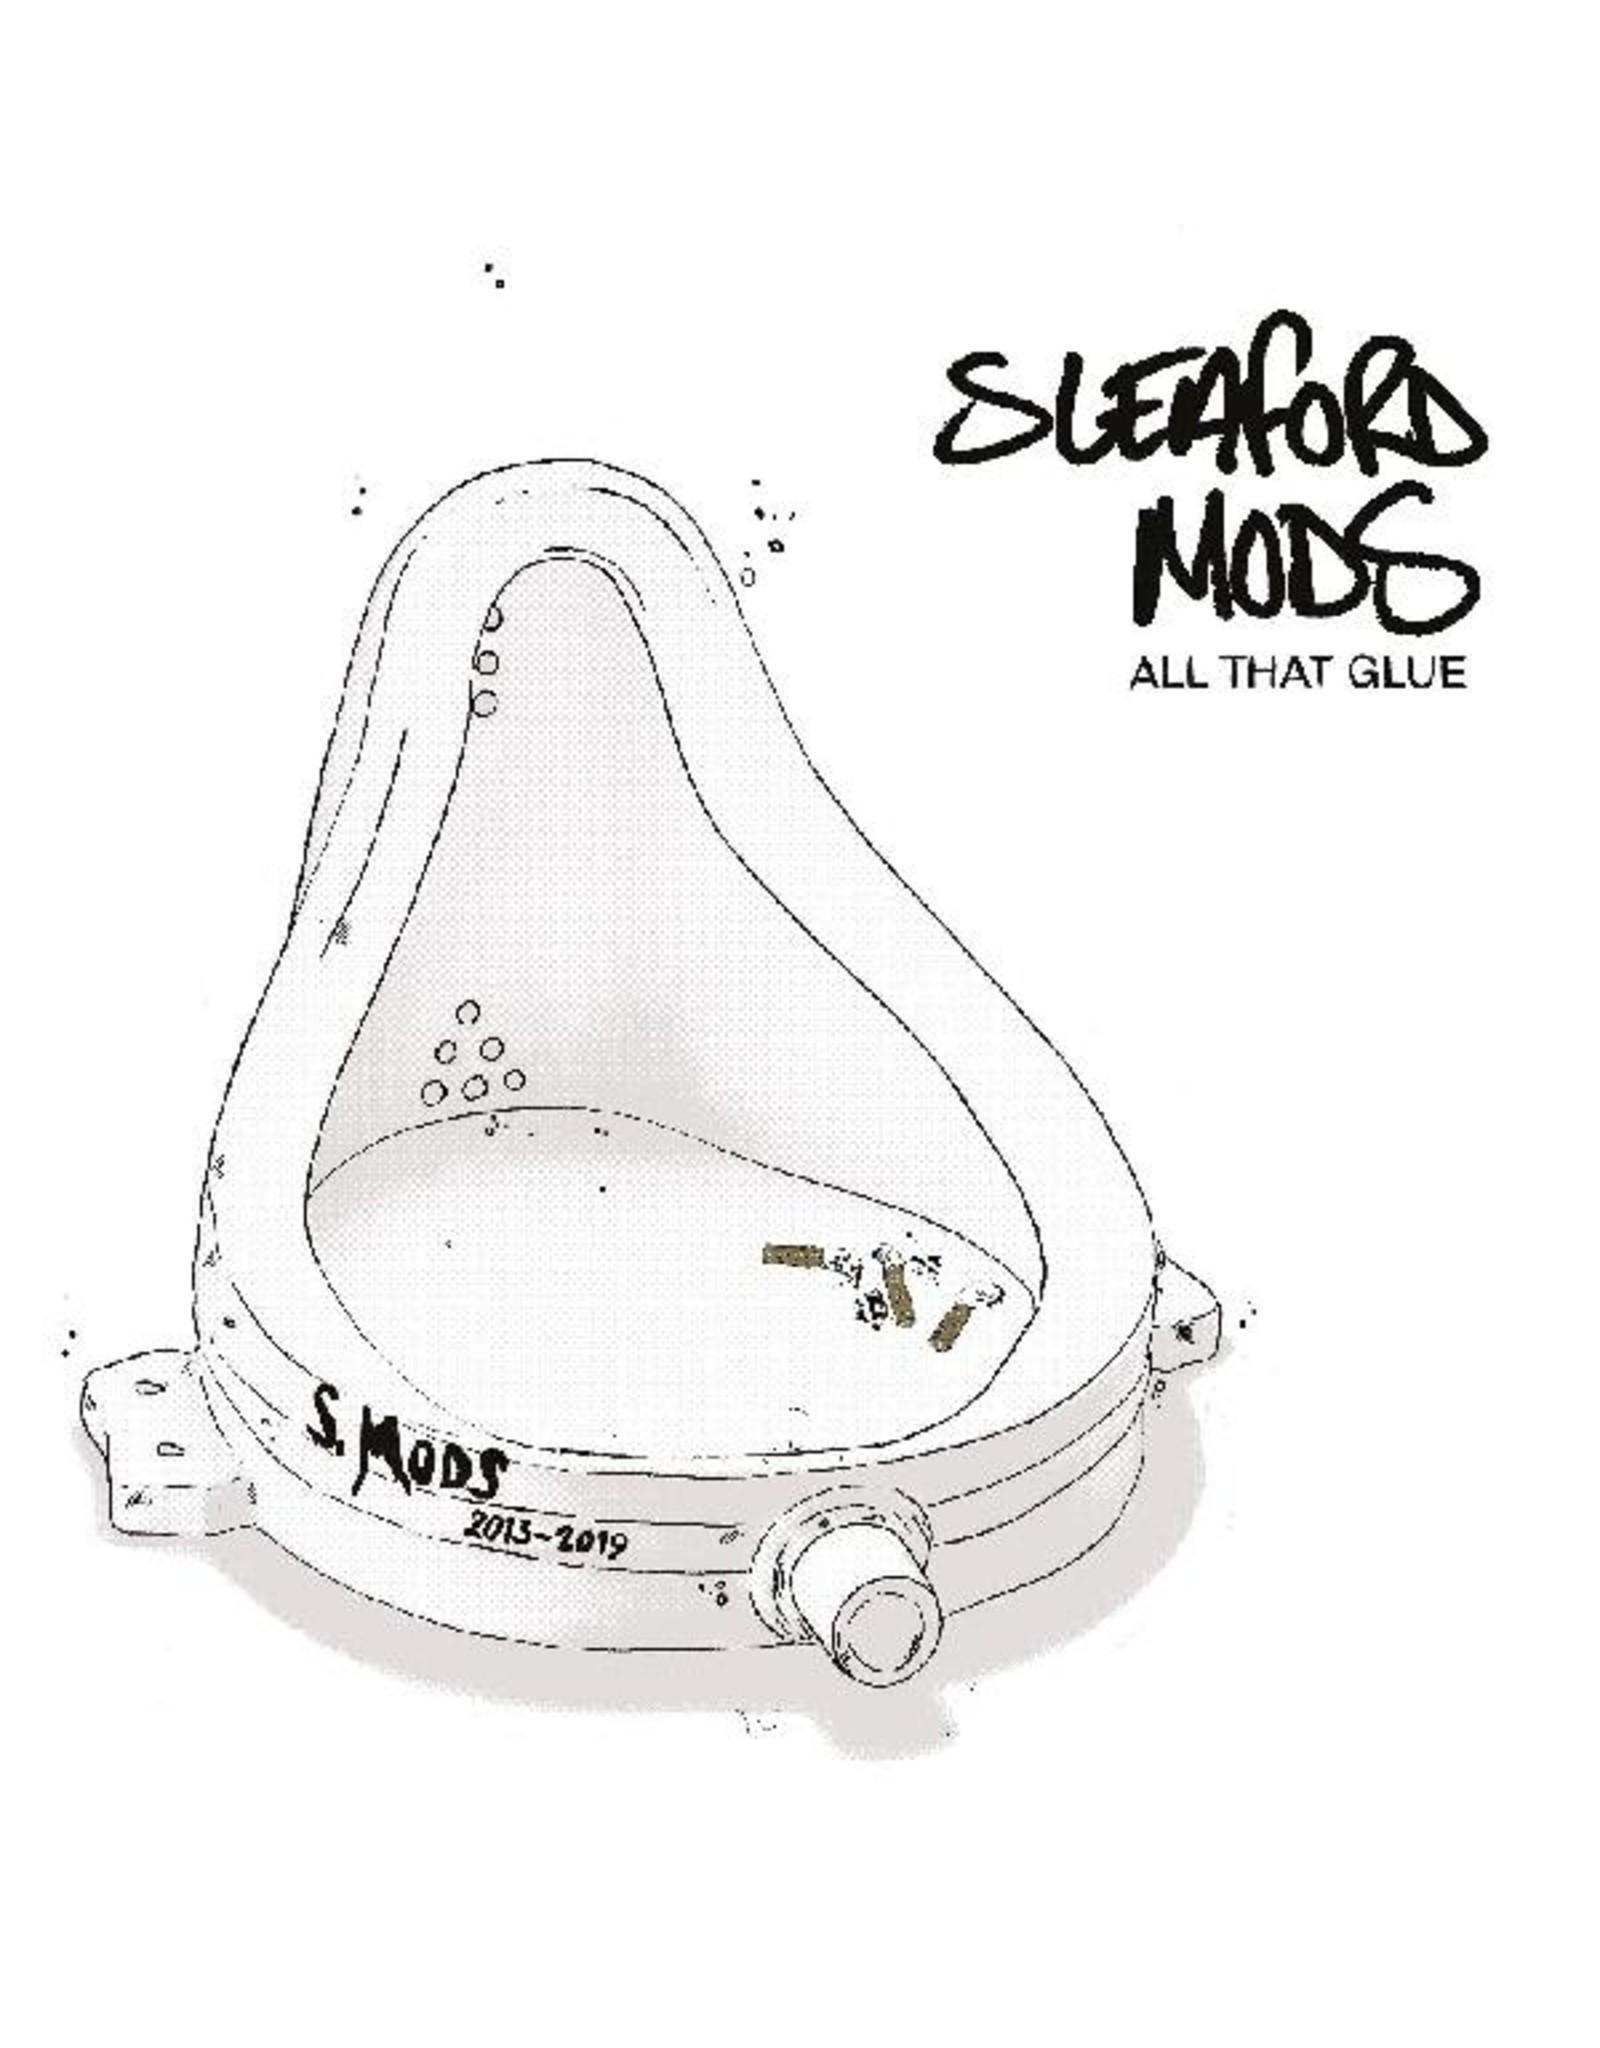 New Vinyl Sleaford Mods - All That Glue 2LP